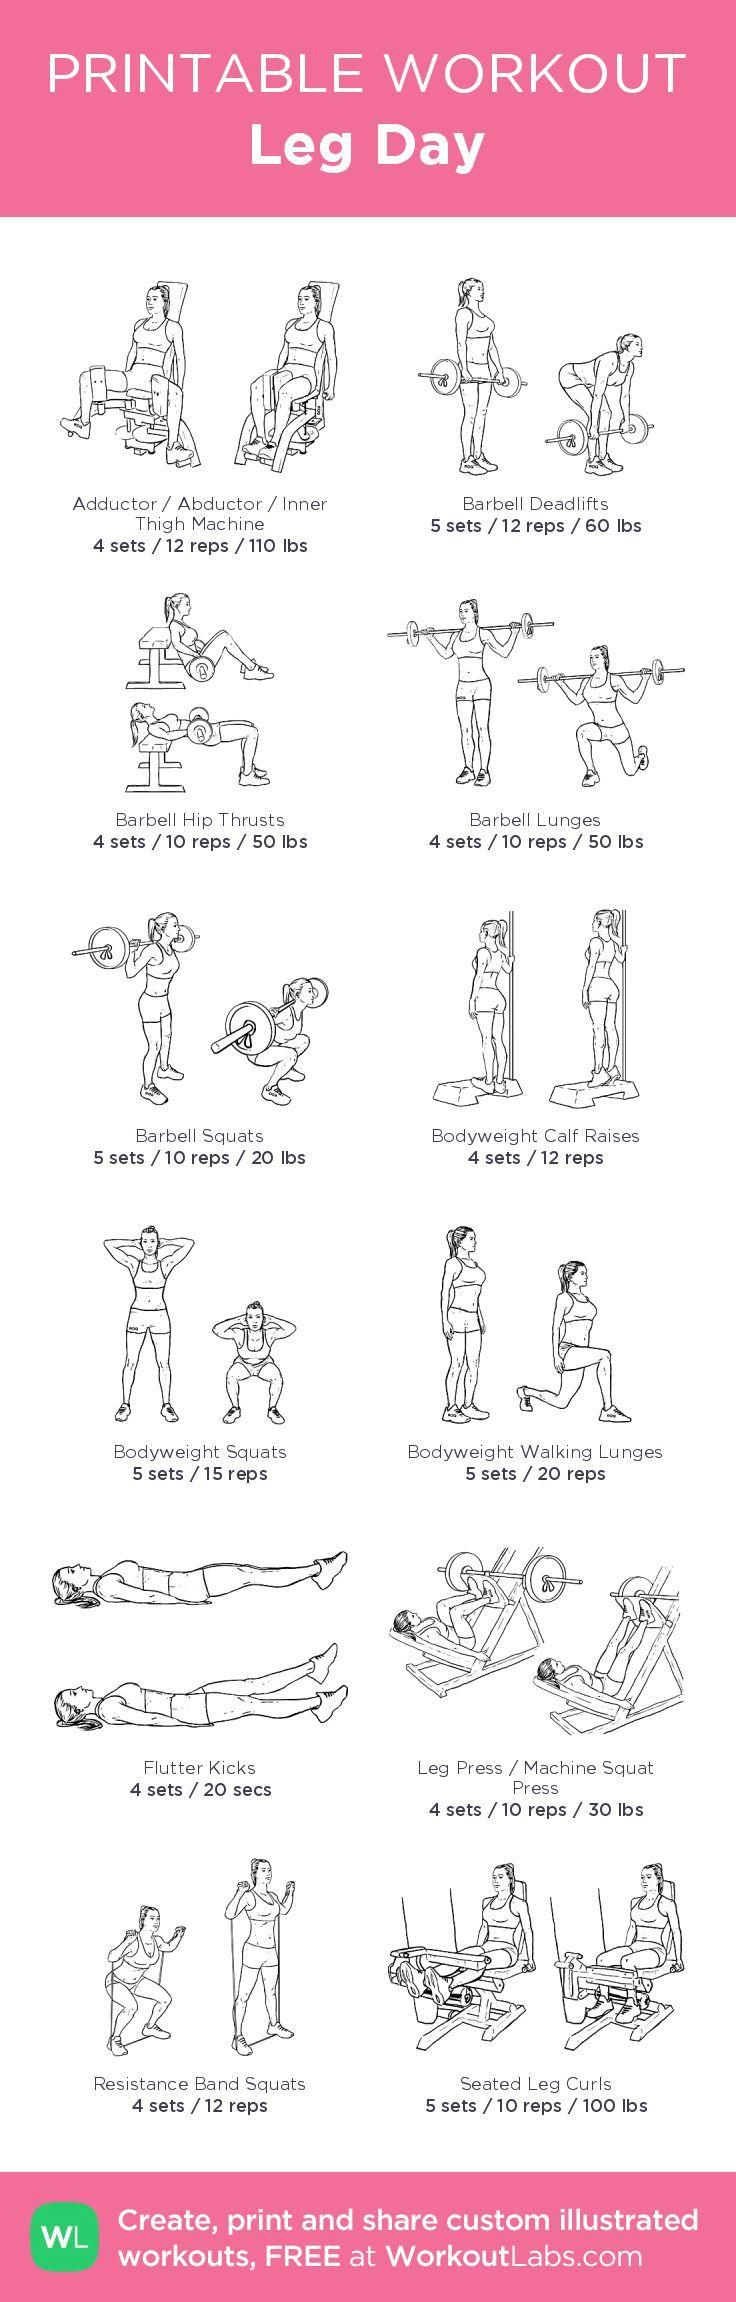 Home | Gains | Workout, Printable workouts, Gym workouts